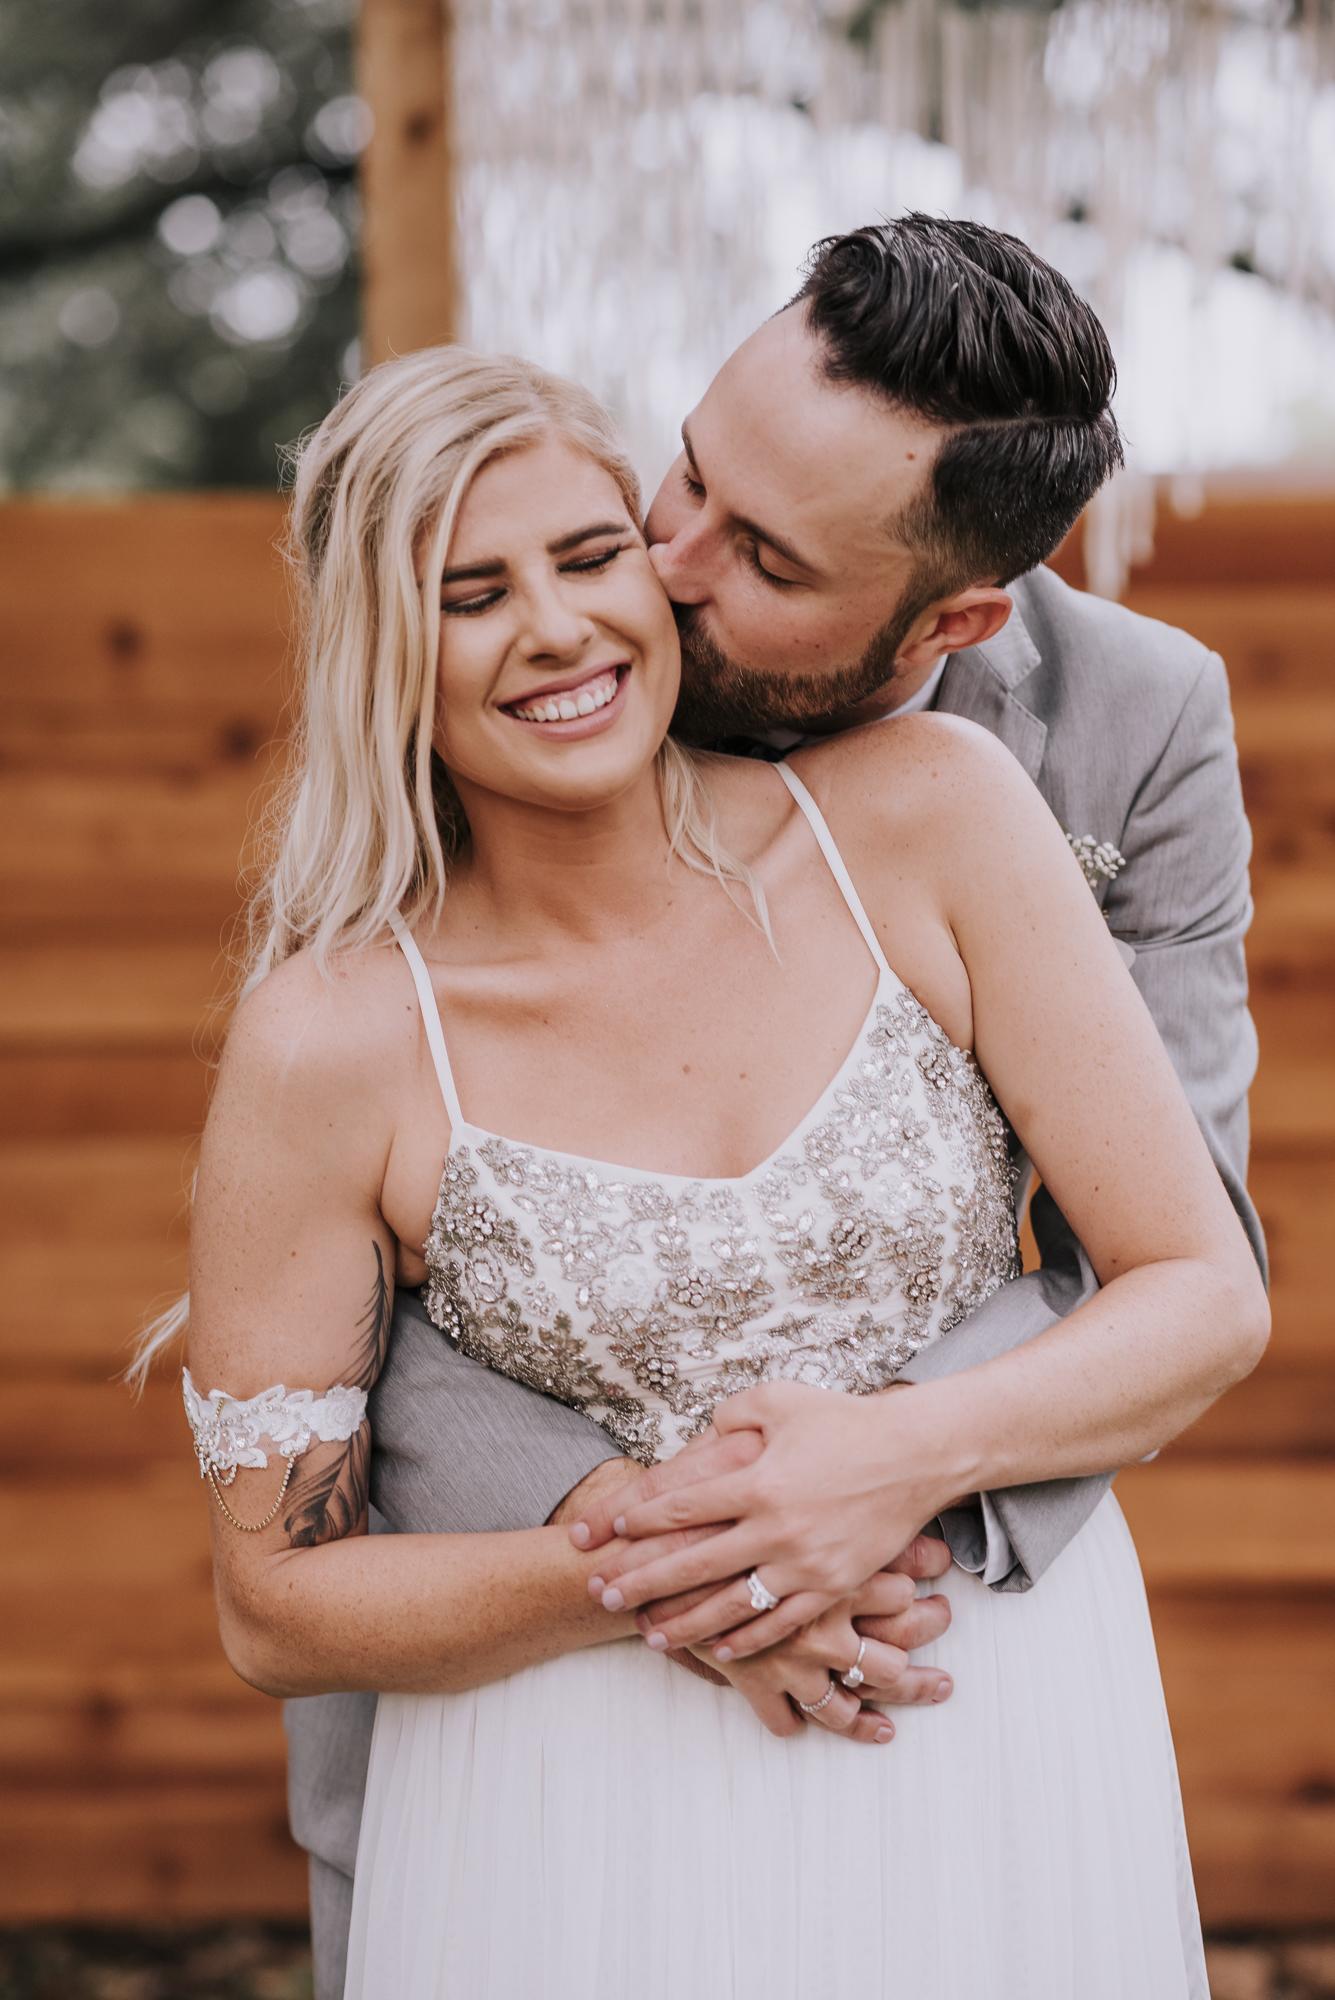 COUPLES - engagements, weddings, anniversaries